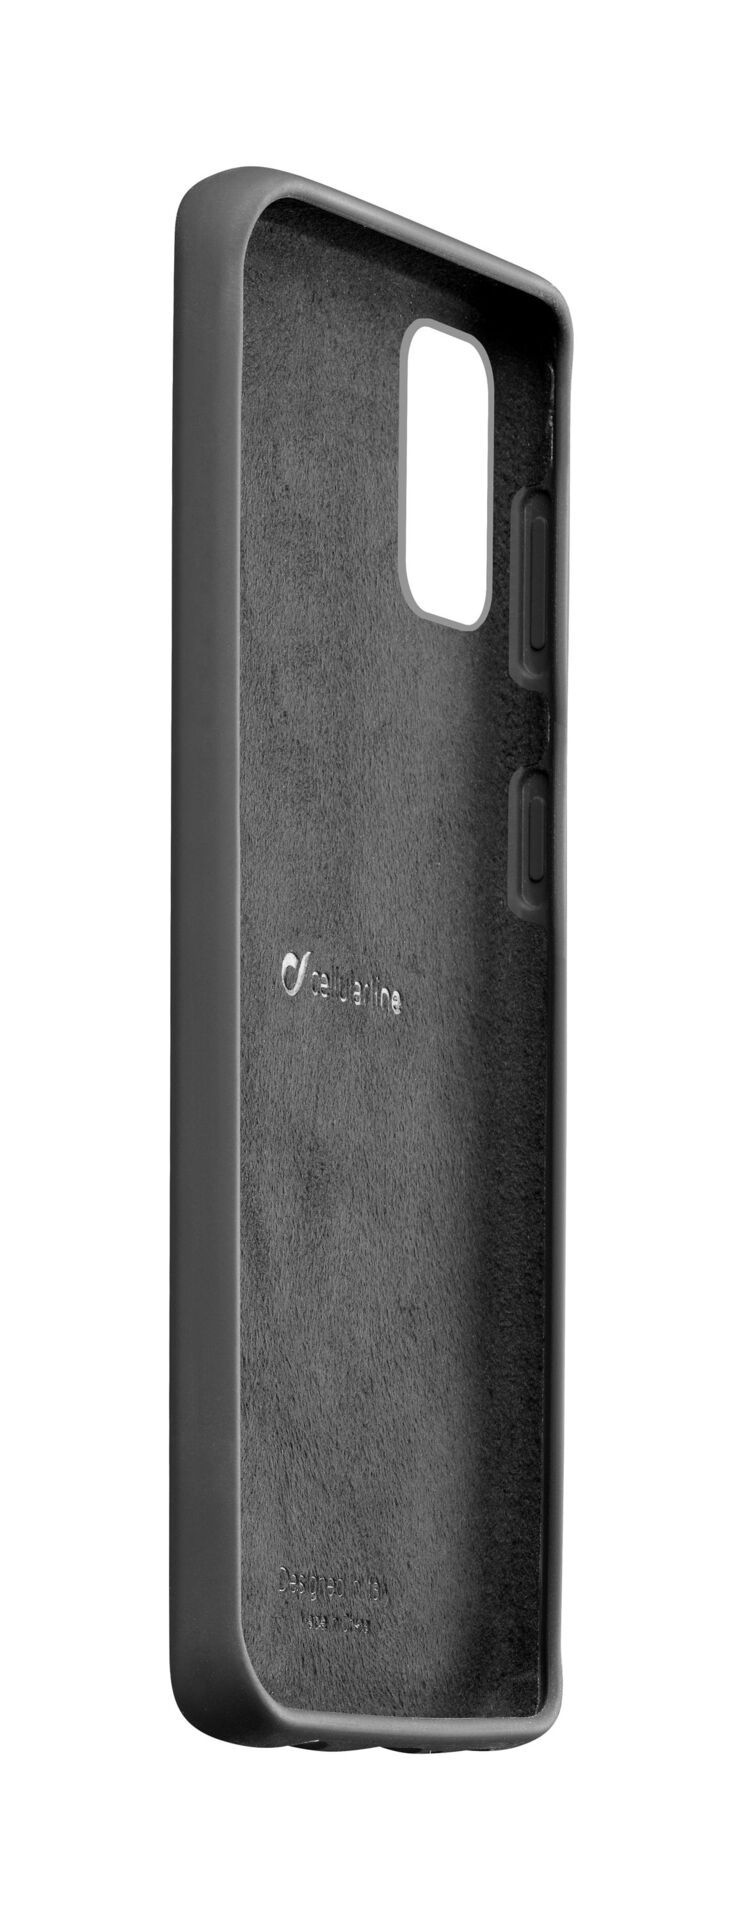 Калъф за Samsung Galaxy S10 Lite Cellularline - Sensation, черен - 2